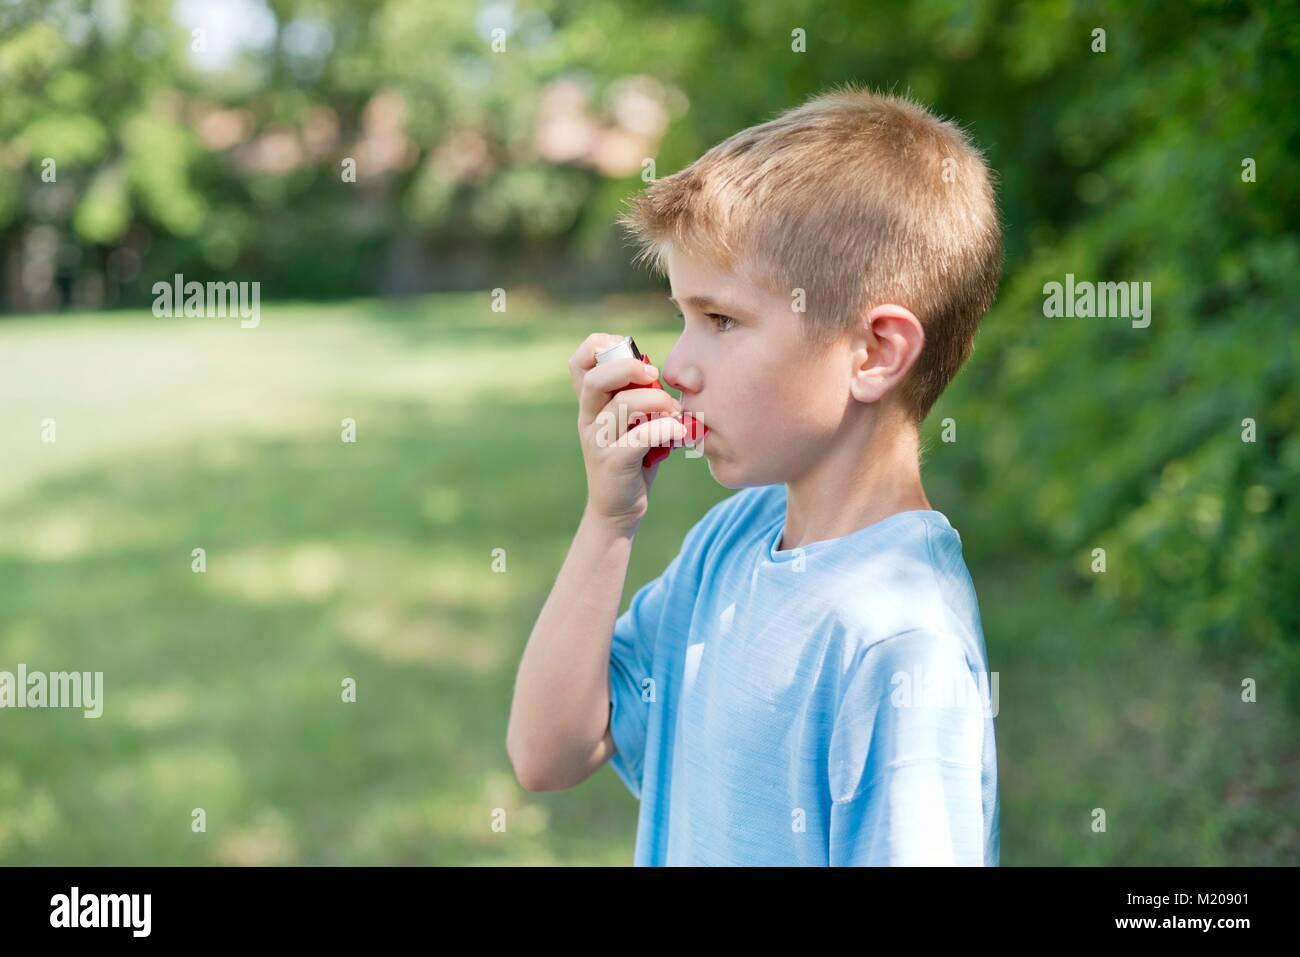 Young boy using an inhaler. - Stock Image